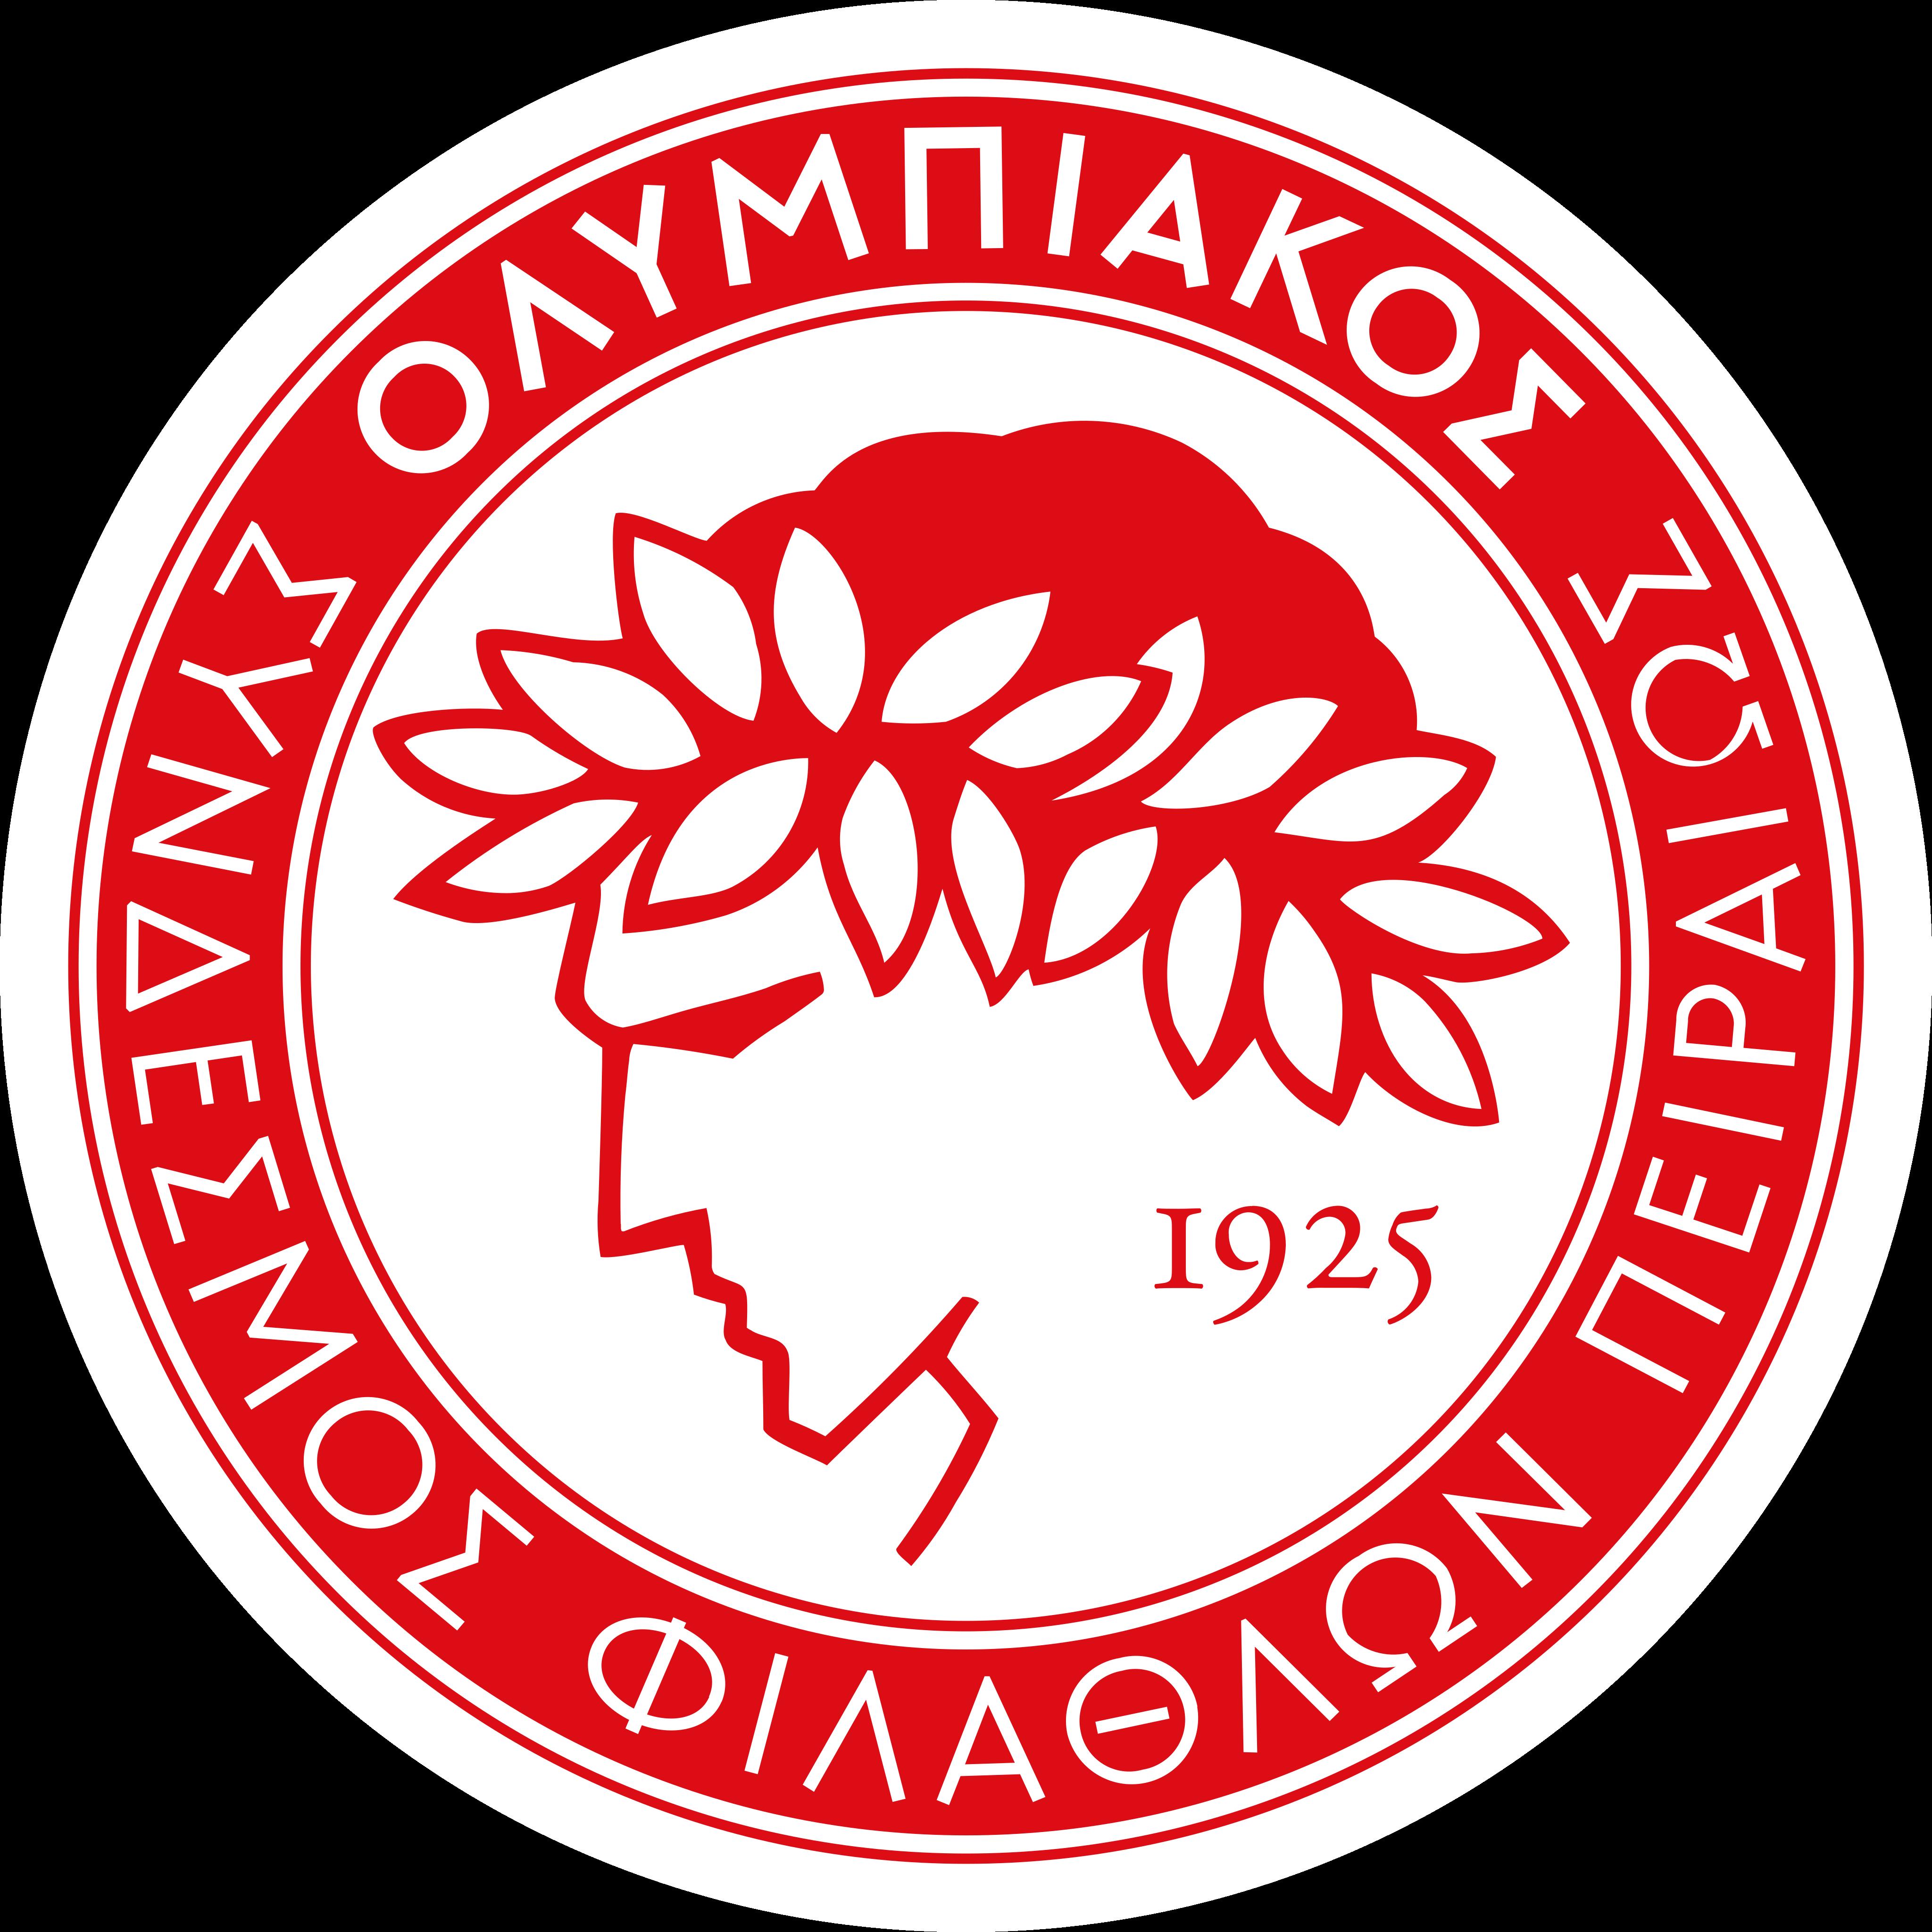 olympiacos logo 1 - Olympiacos Logo - Escudo